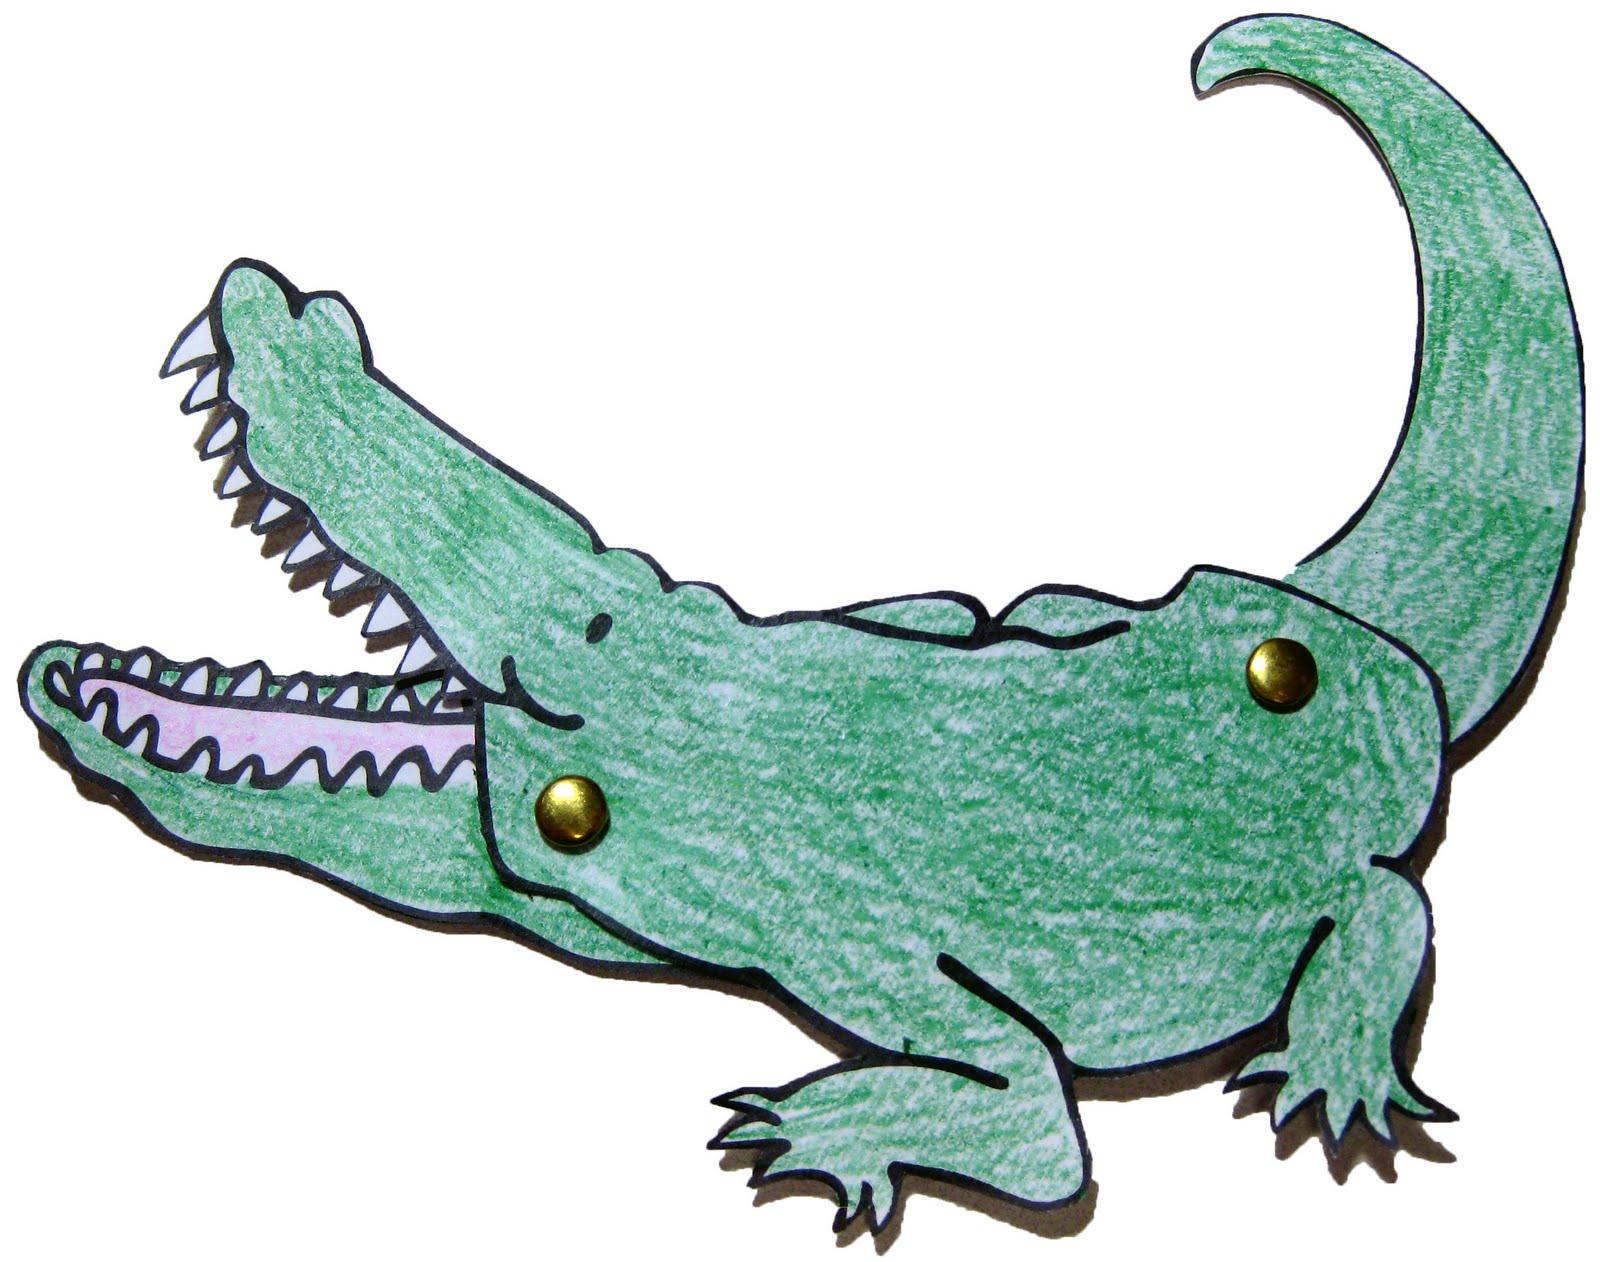 Alligator Crafts For Preschoolers Topsimages